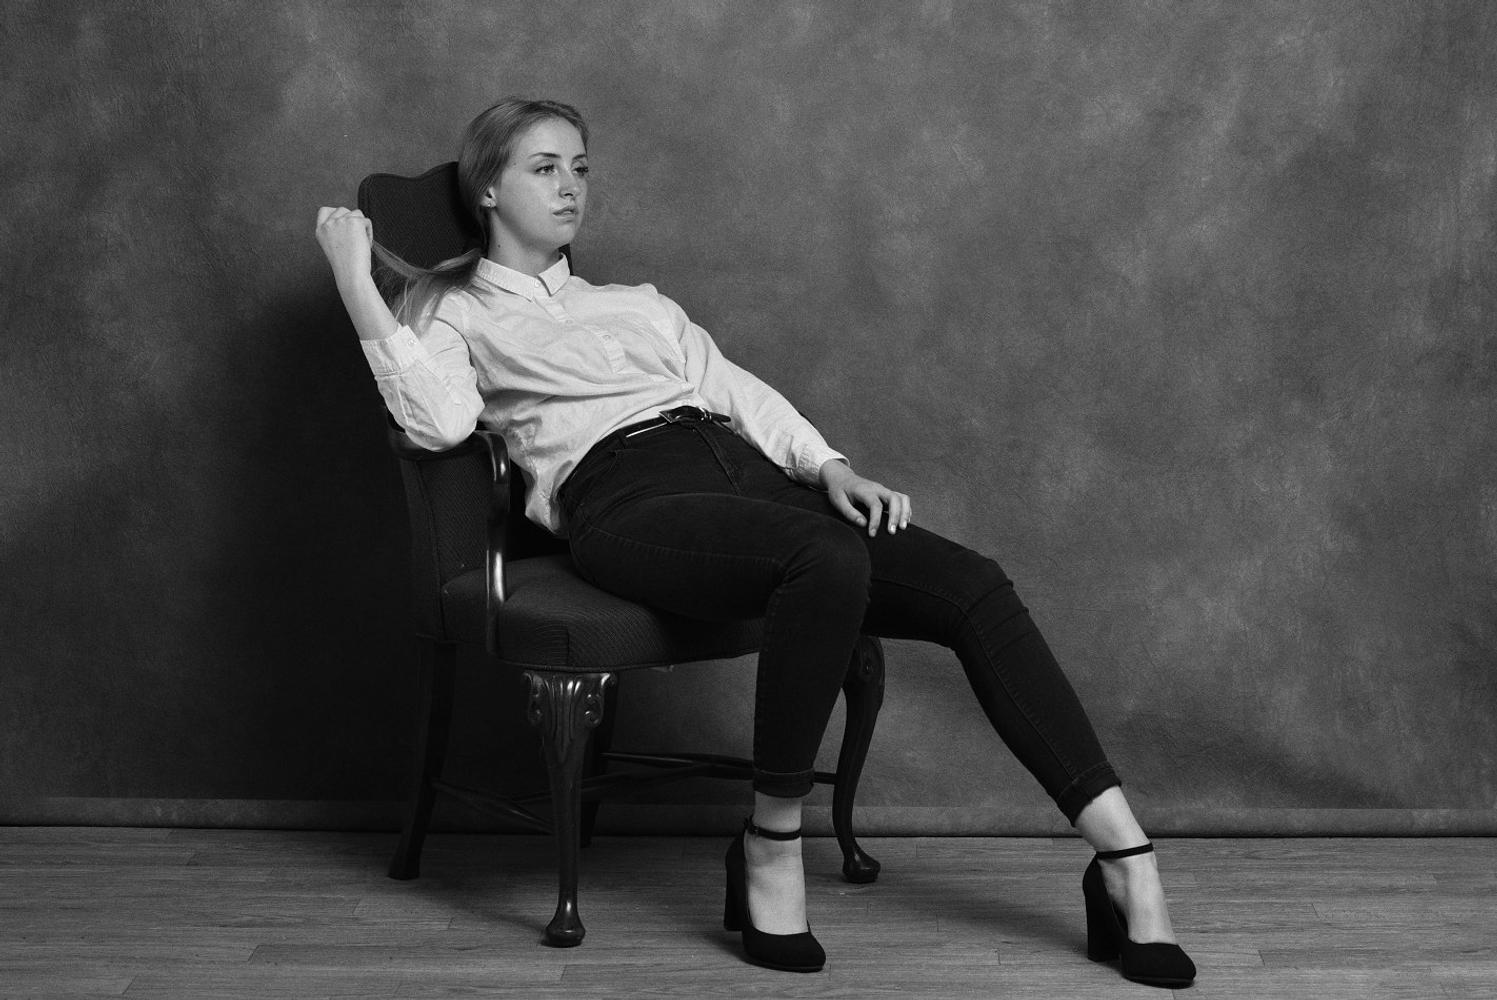 Harlea Robinson represented by The Tabb Agency